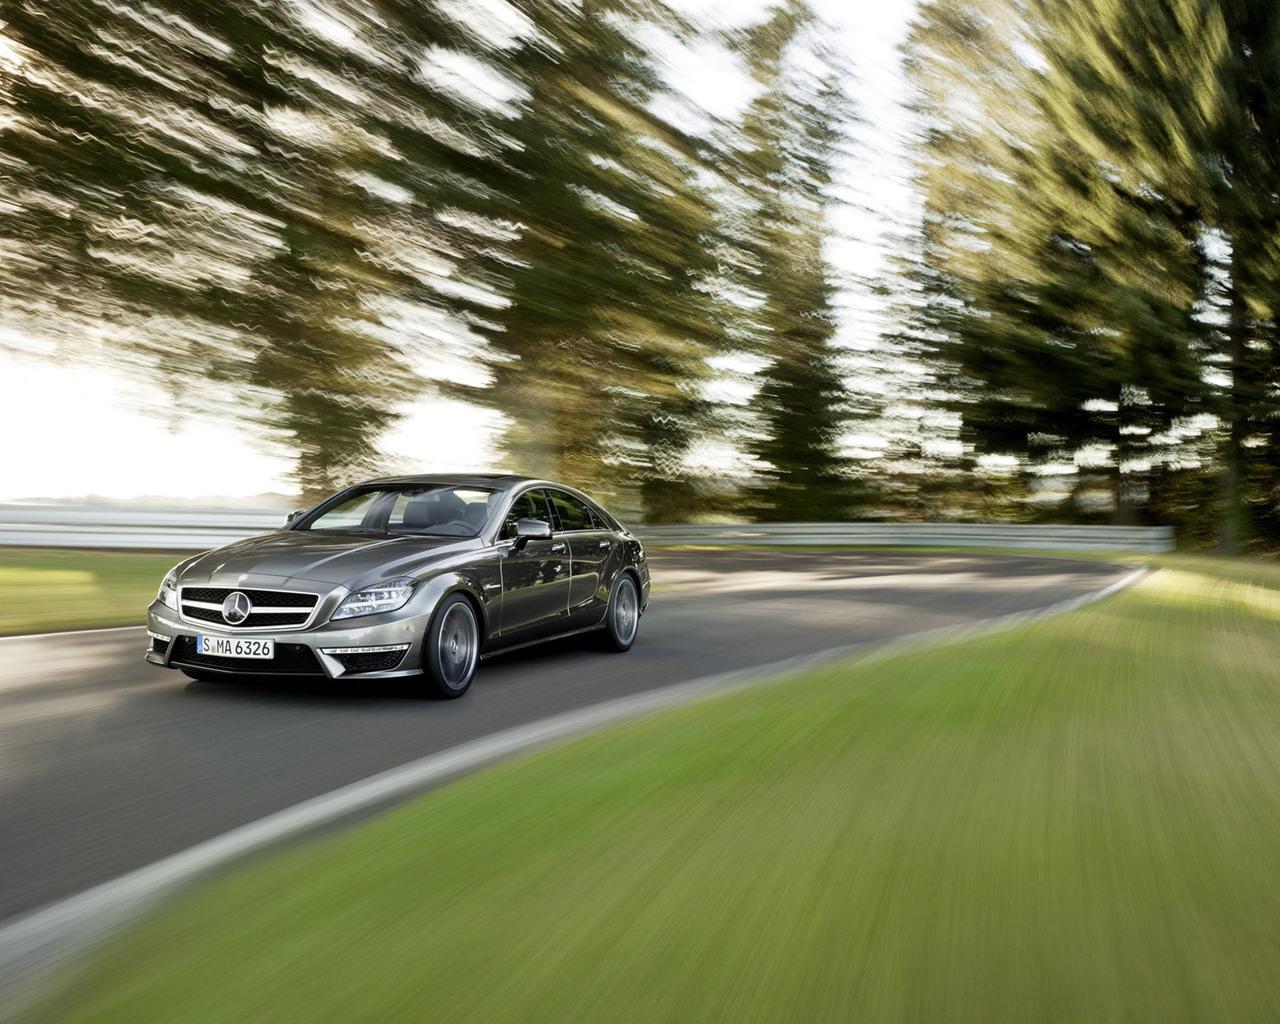 Mercedes-Benz, CLS 63 AMG, 2011 обои